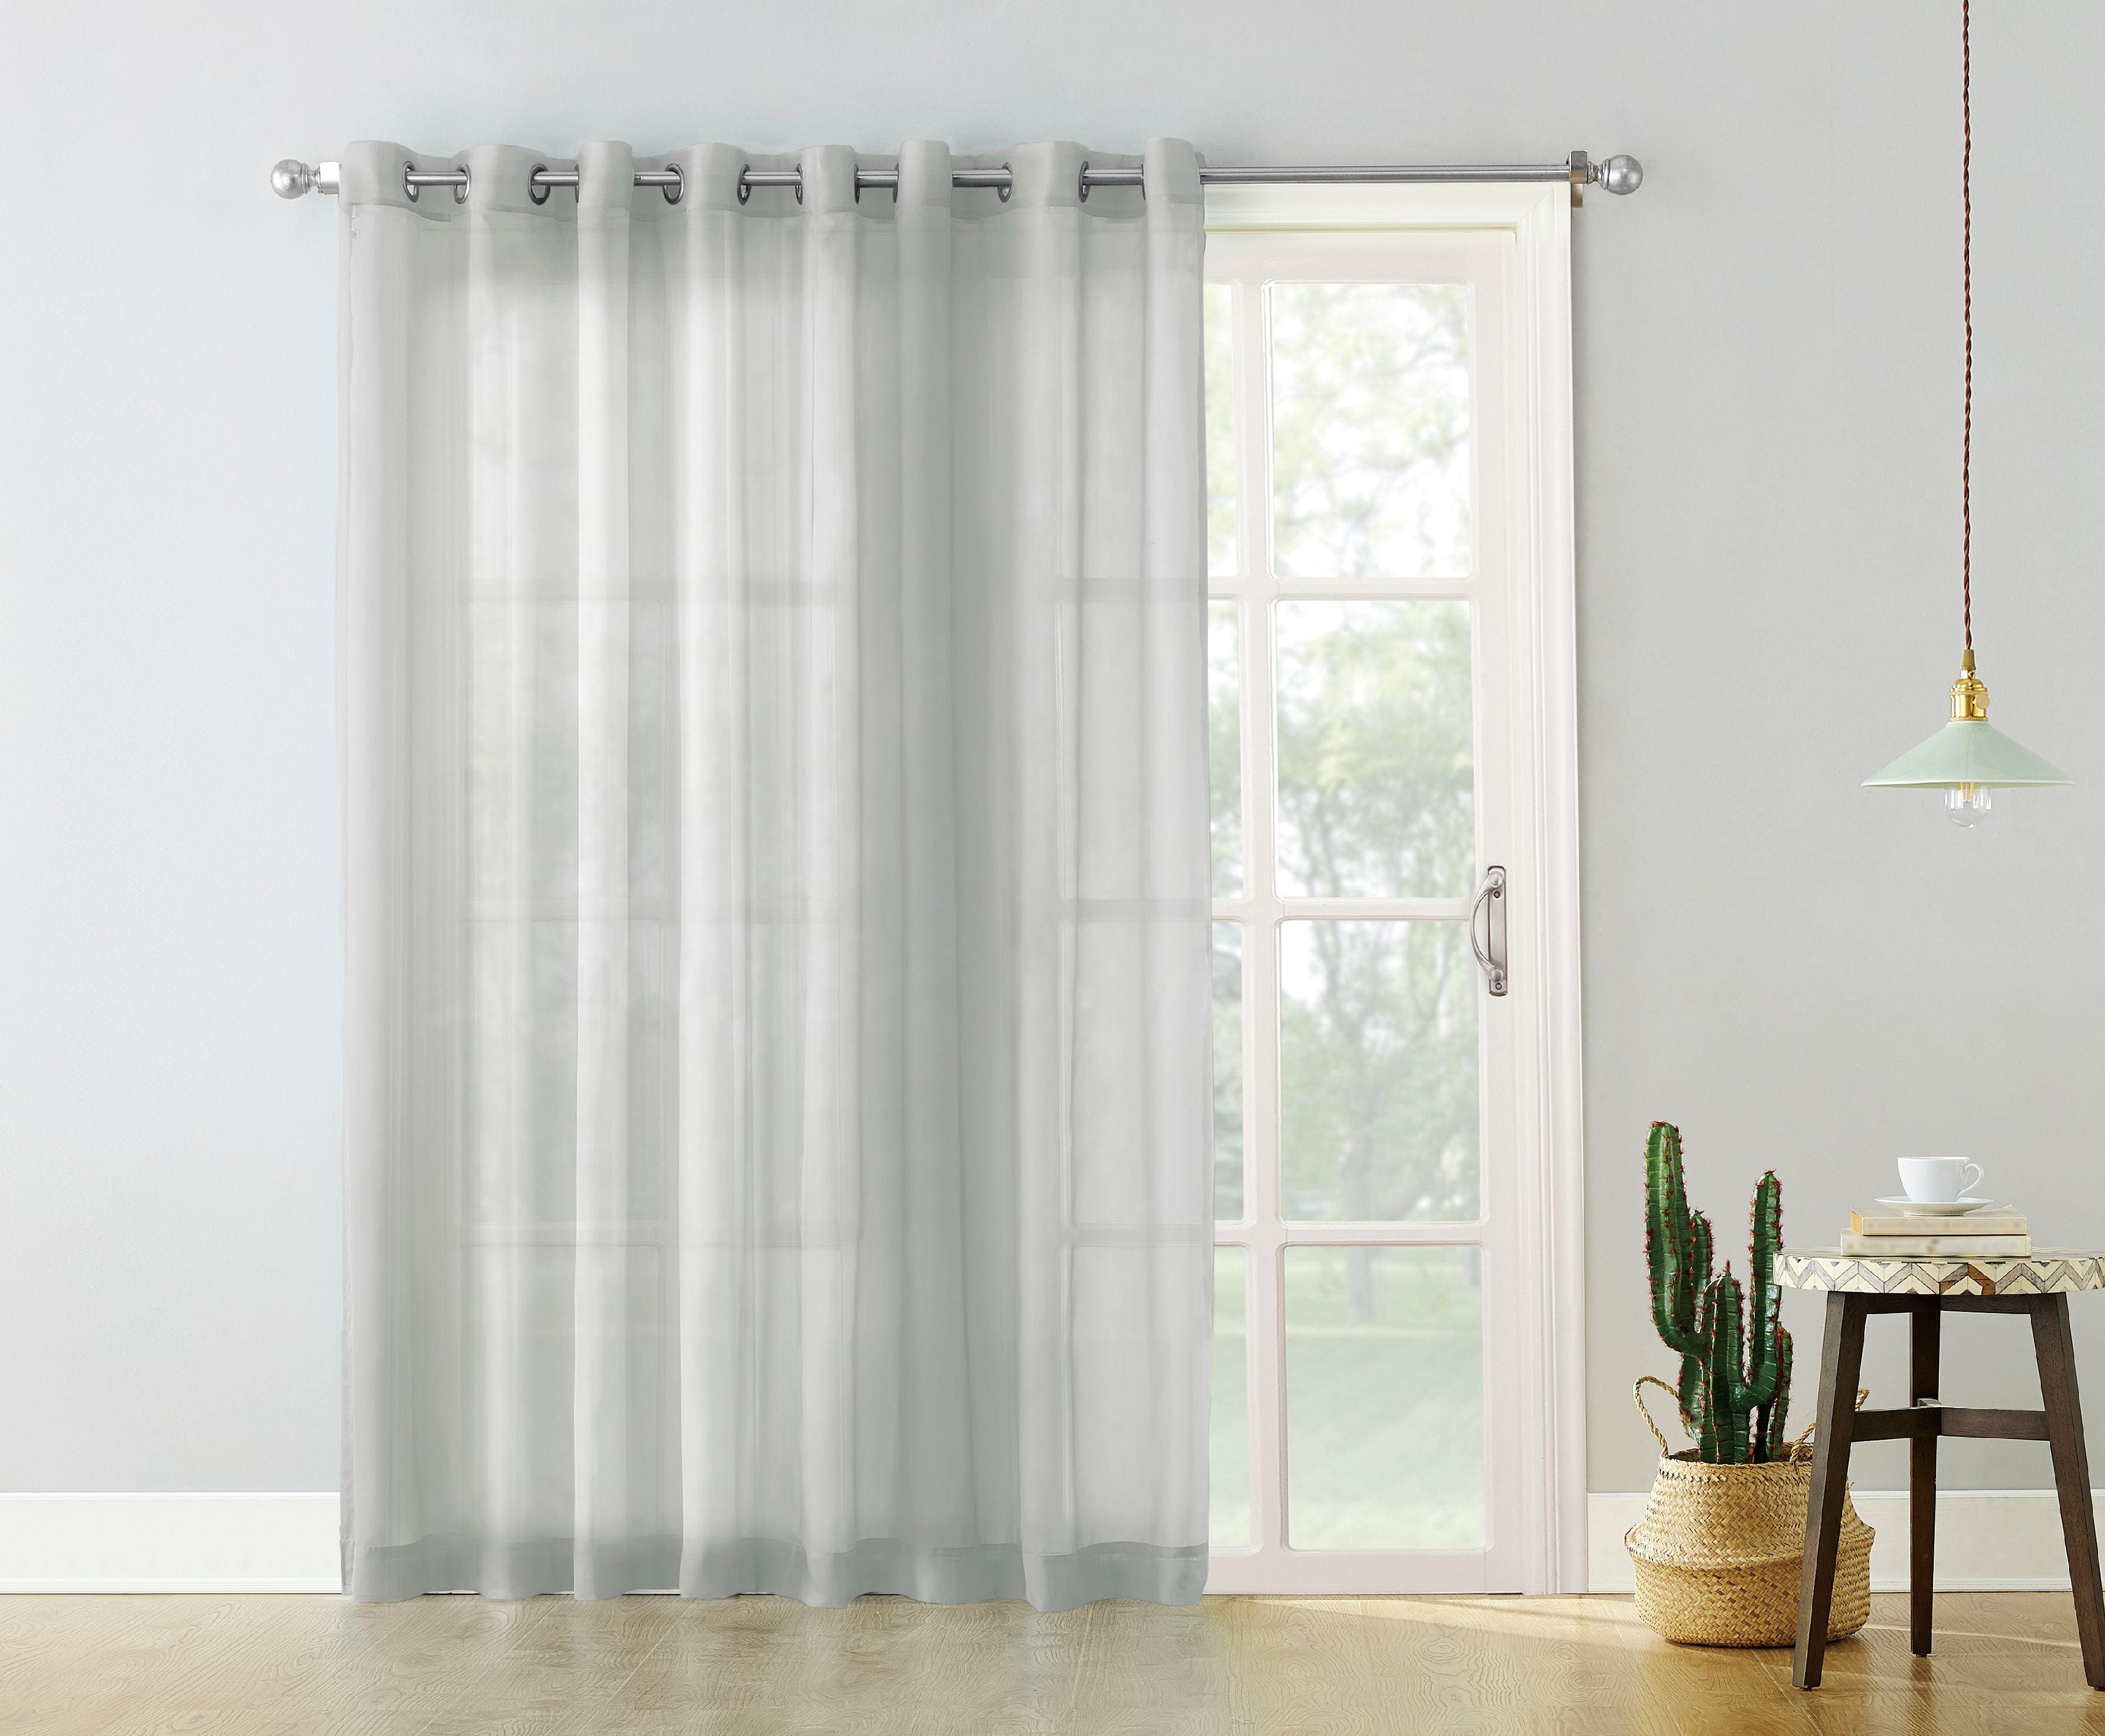 No 918 Emily Extra Wide Sheer Voile Sliding Door Patio Curtain Panel Walmart Com Walmart Com